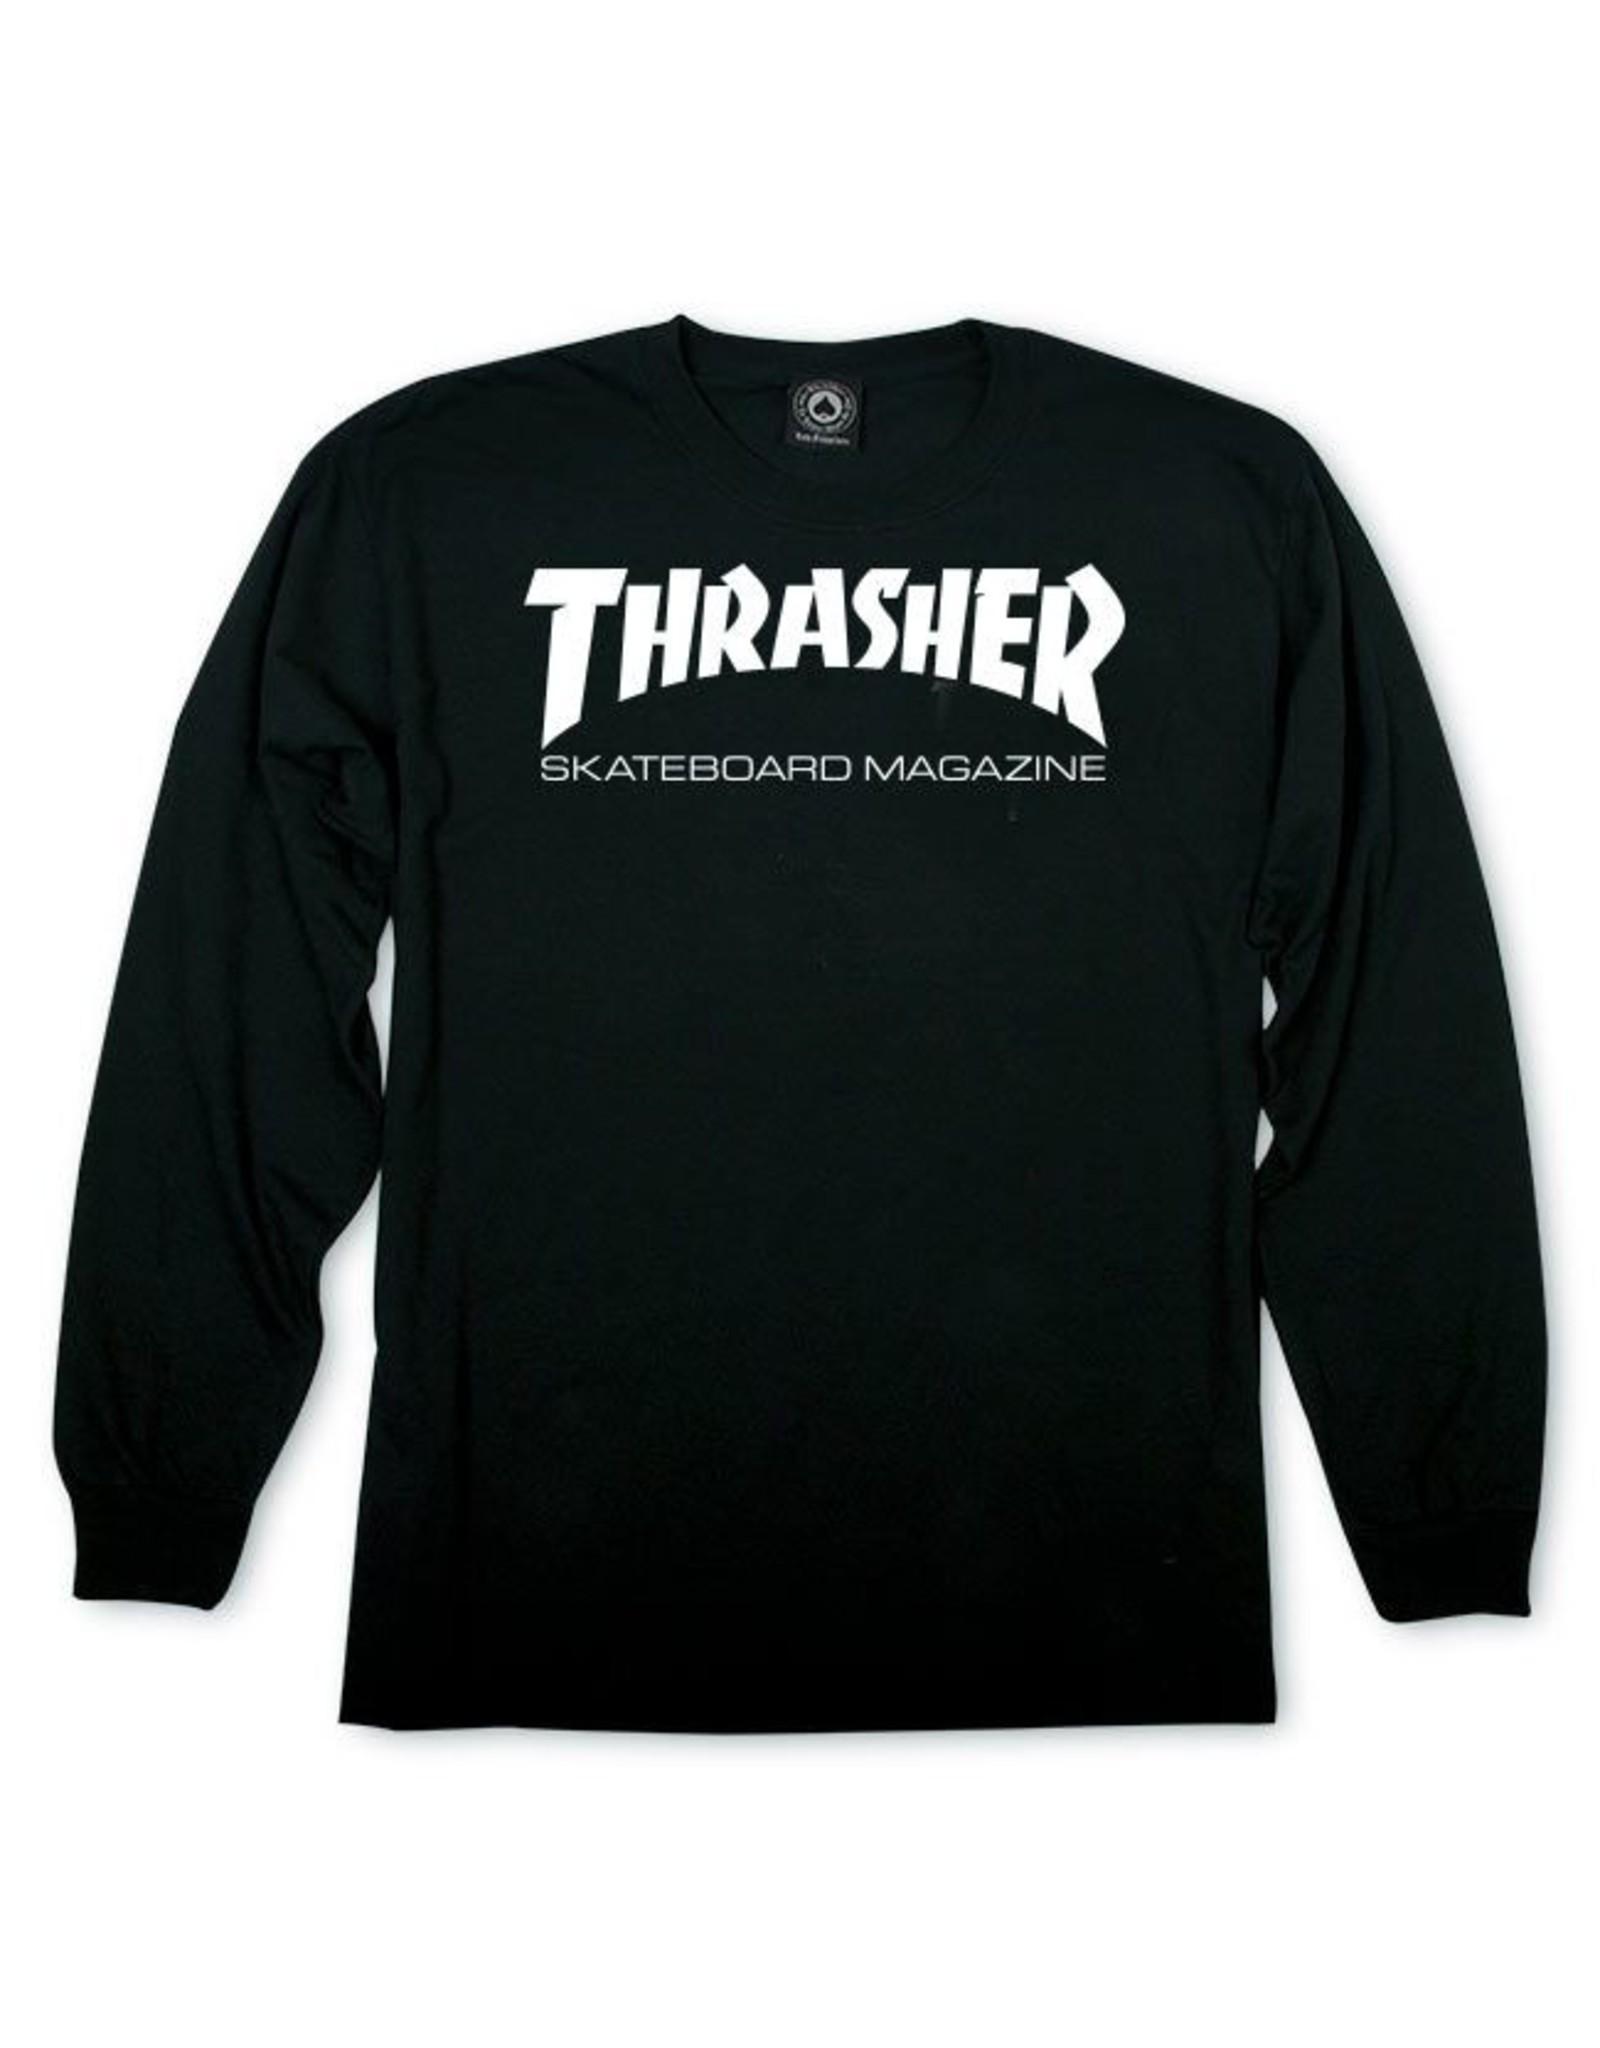 THRASHER THRASHER - SKATE MAG L/S - BLACK